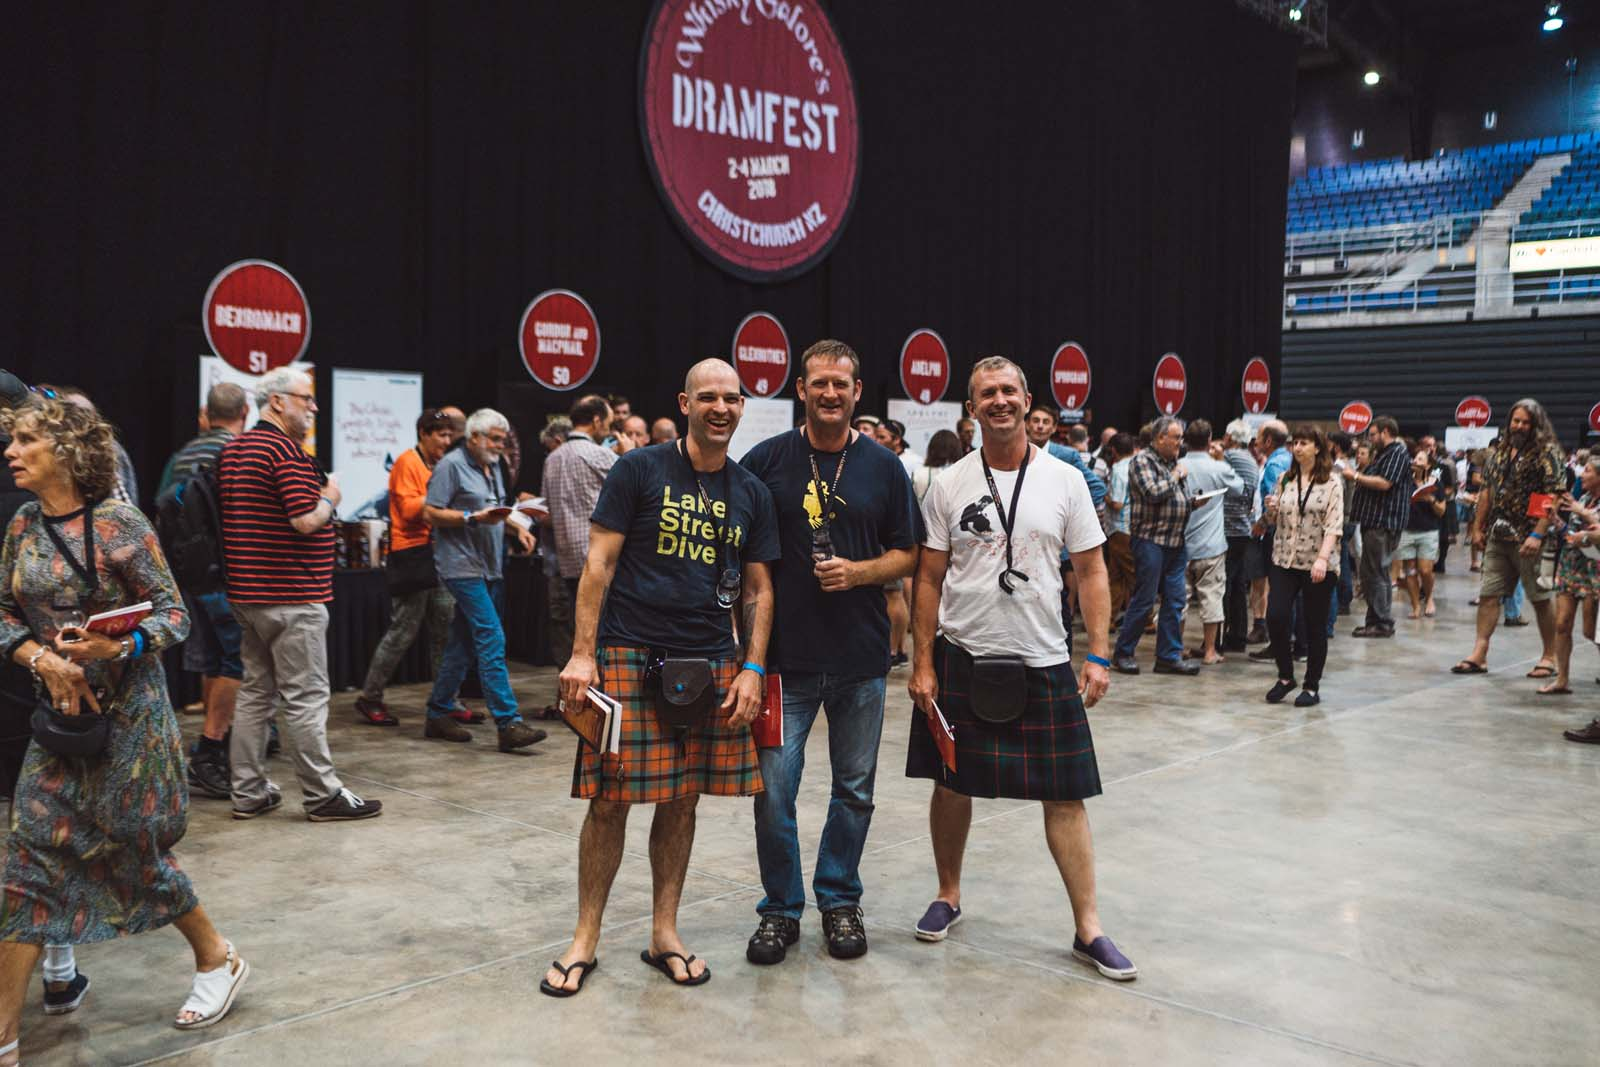 Dramfest 2018 for Whisky Galore-301.jpg